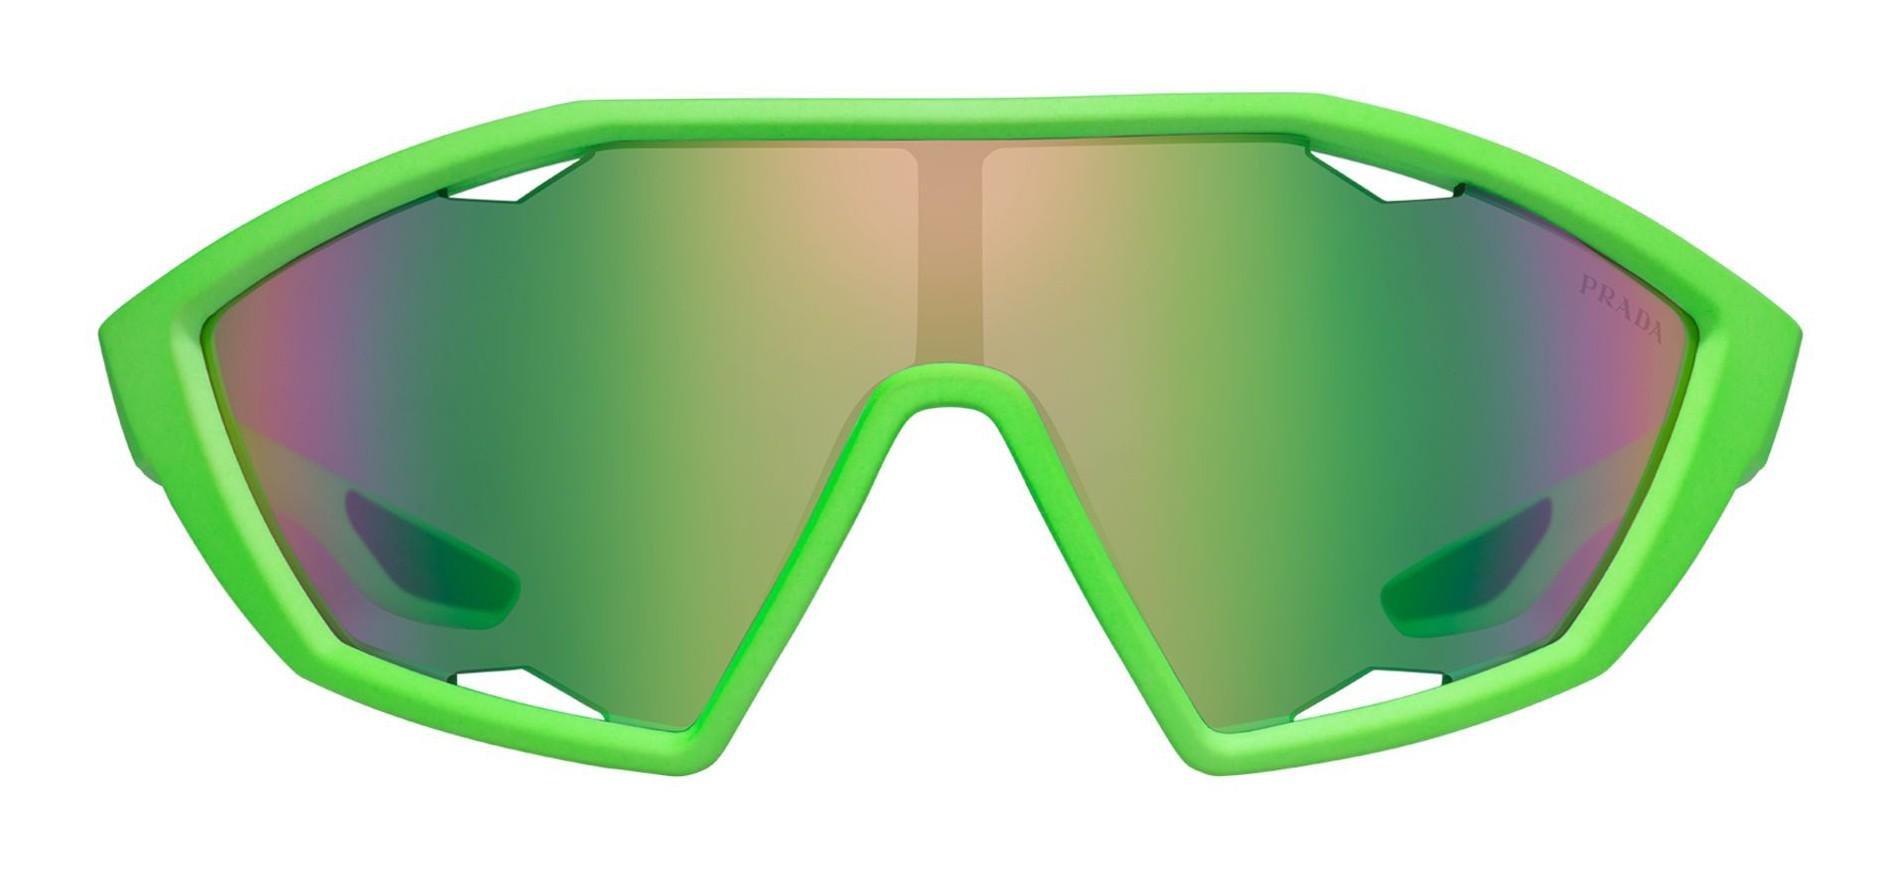 8c93c0c17d61 Prada - Prada Linea Rossa Collection - Contemporary Sunglasses - Green - Prada  Collection - Sunglasses - Prada Eyewear - Avvenice